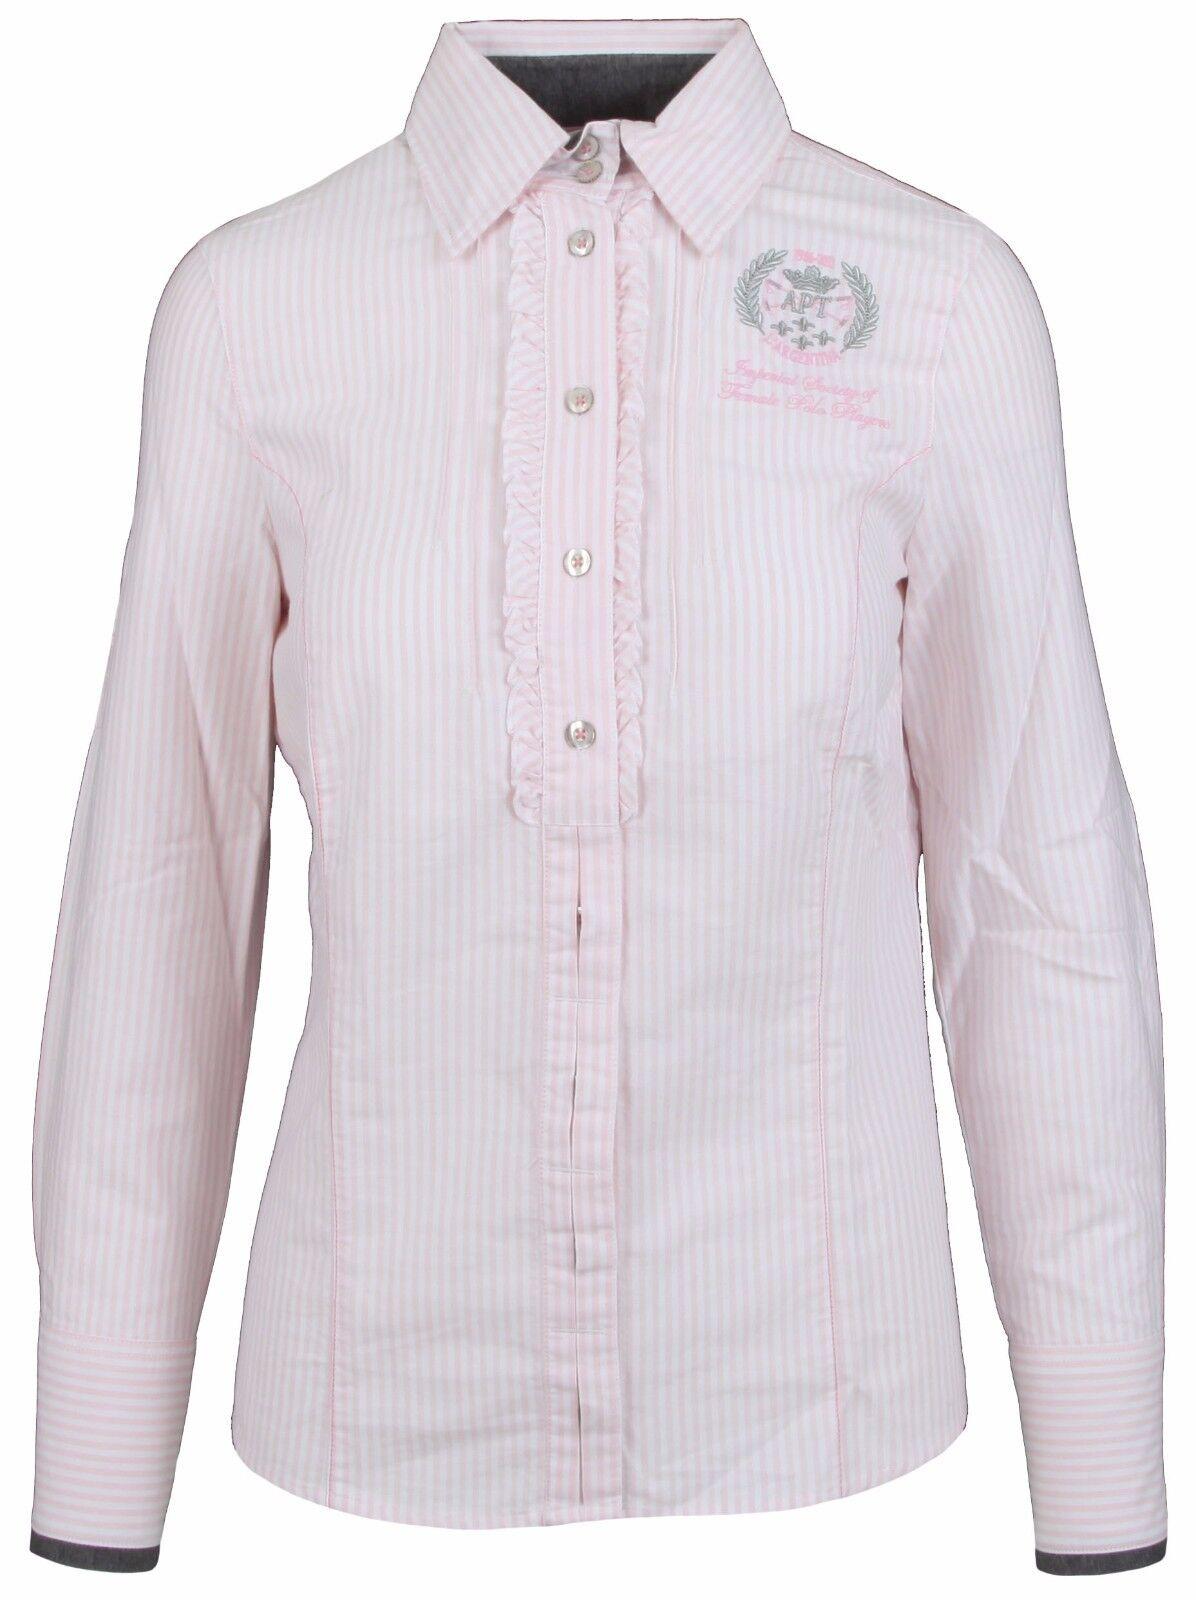 L' SilberINA Damen Blause damen Shirt Größe 38 M 100% Baumwolle Rosa Gestreift